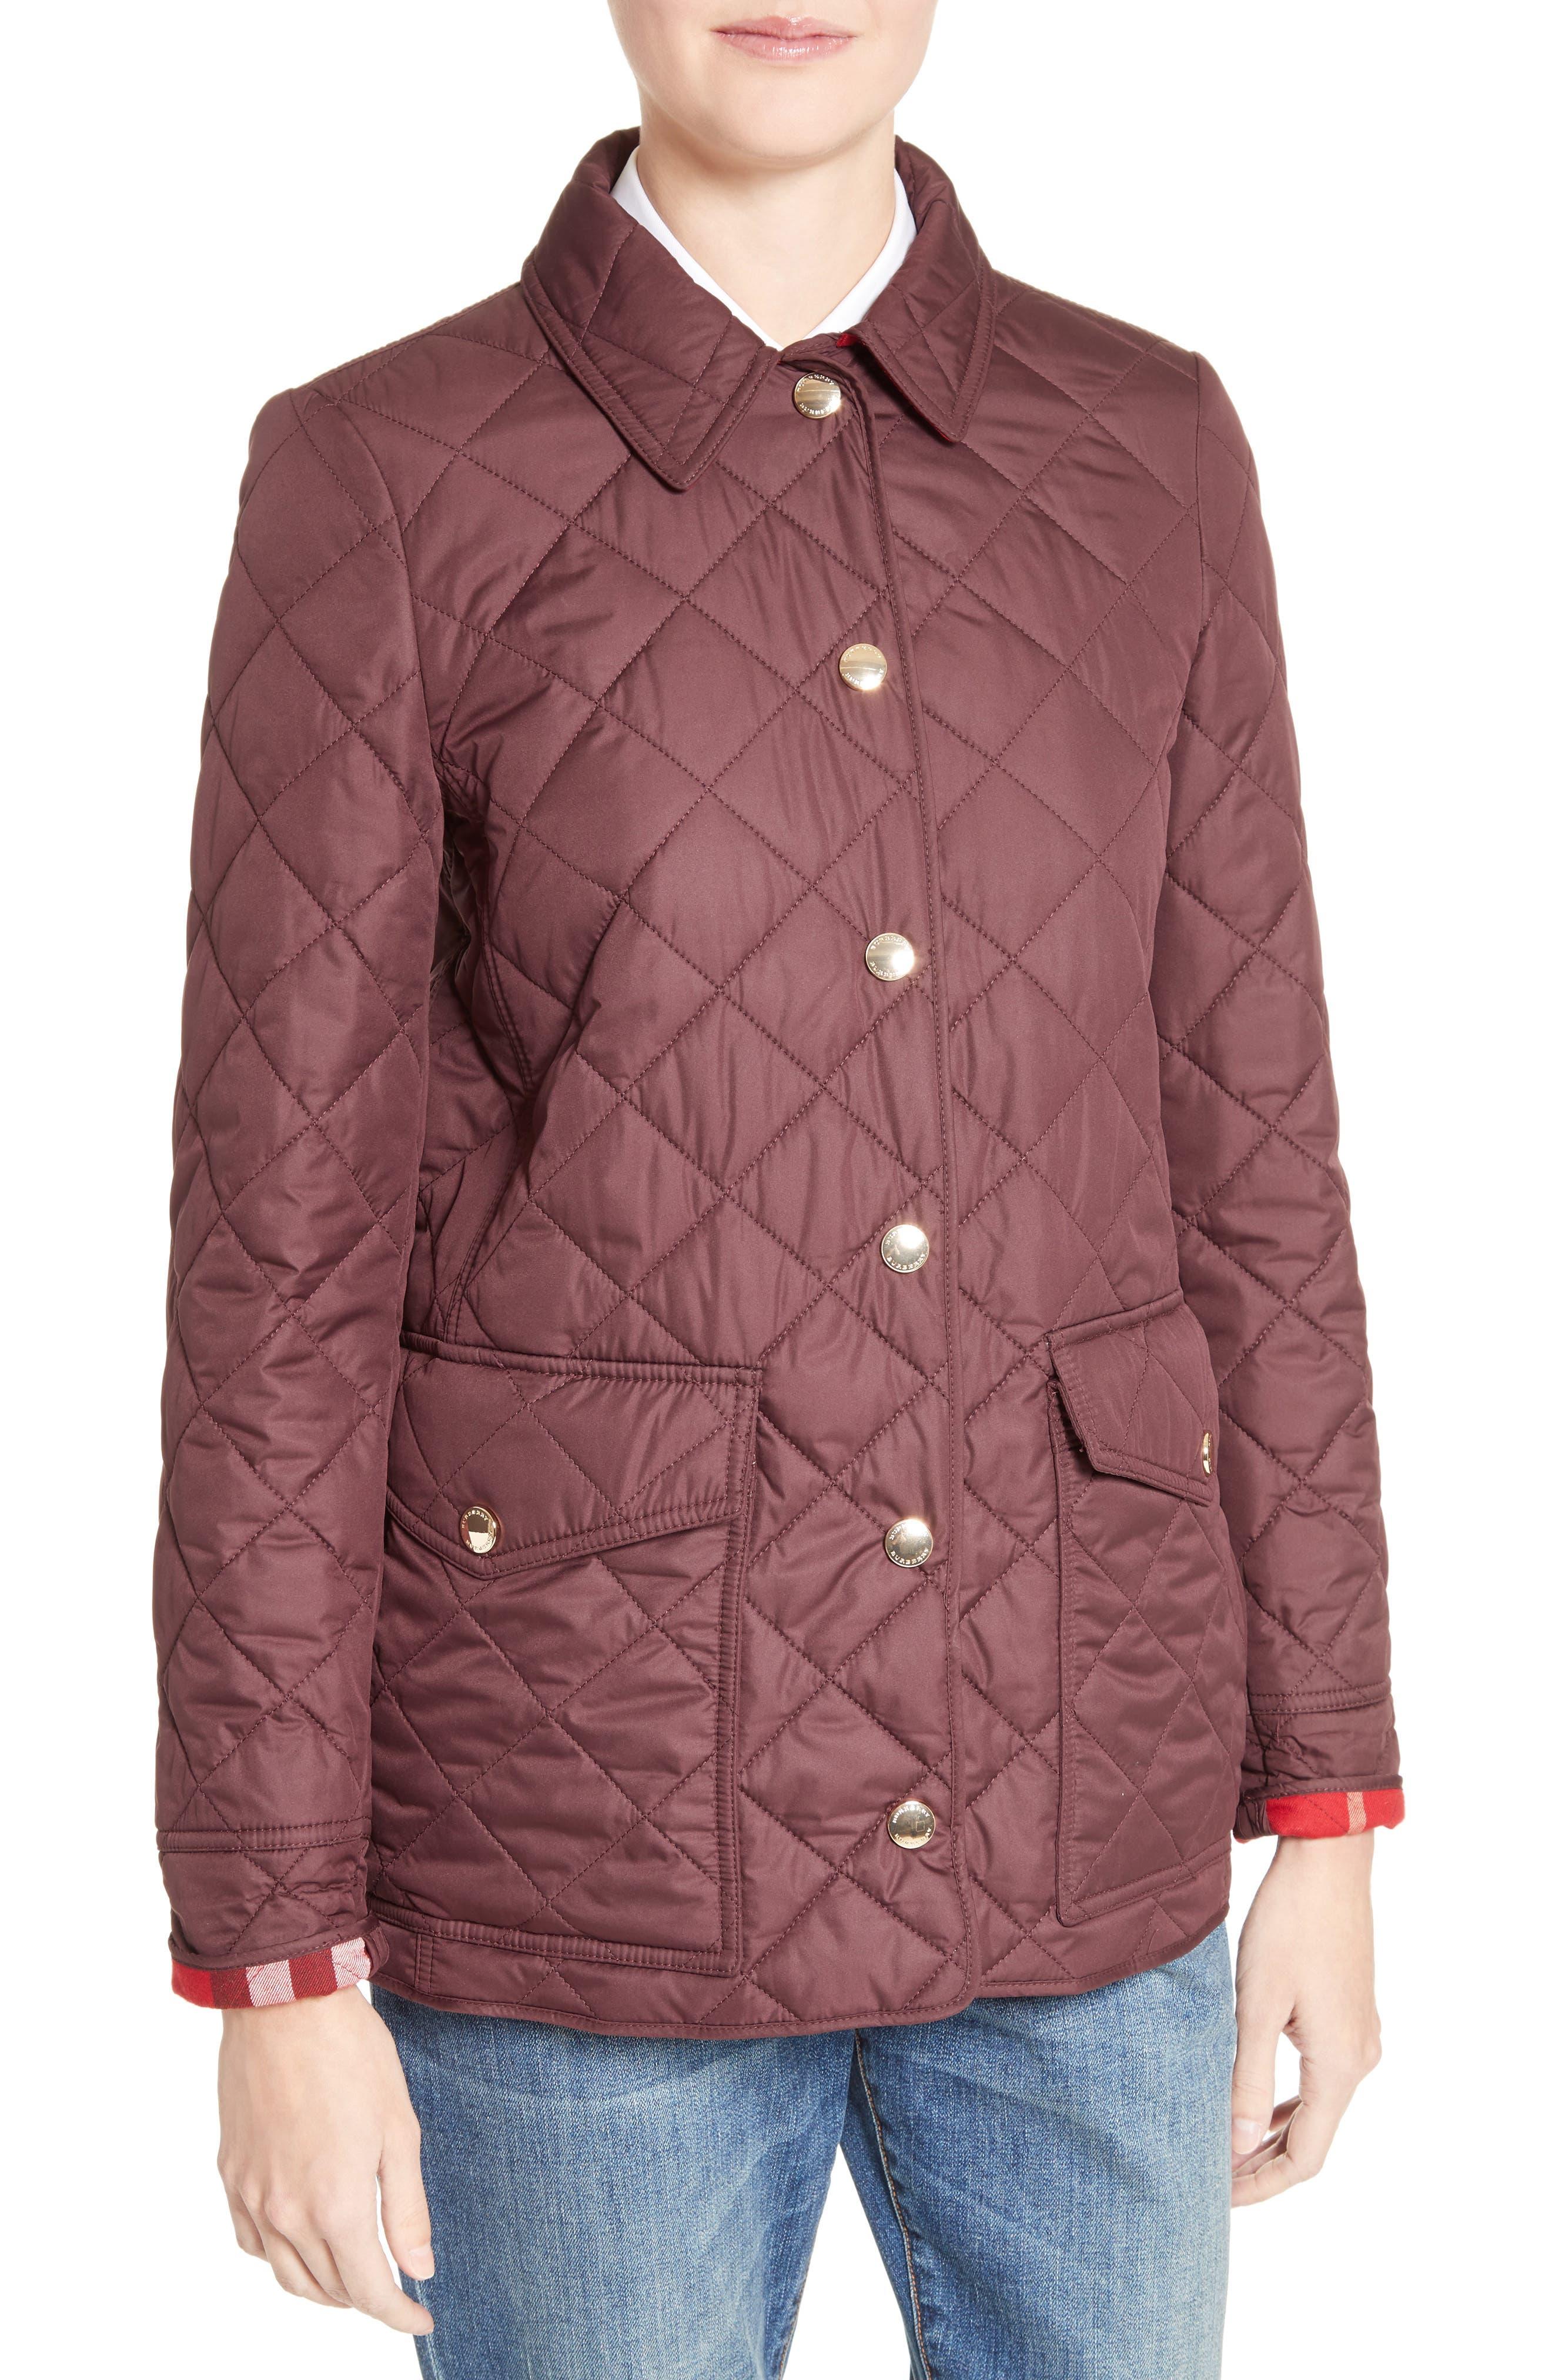 Westbridge Quilted Jacket,                             Alternate thumbnail 6, color,                             Burgundy